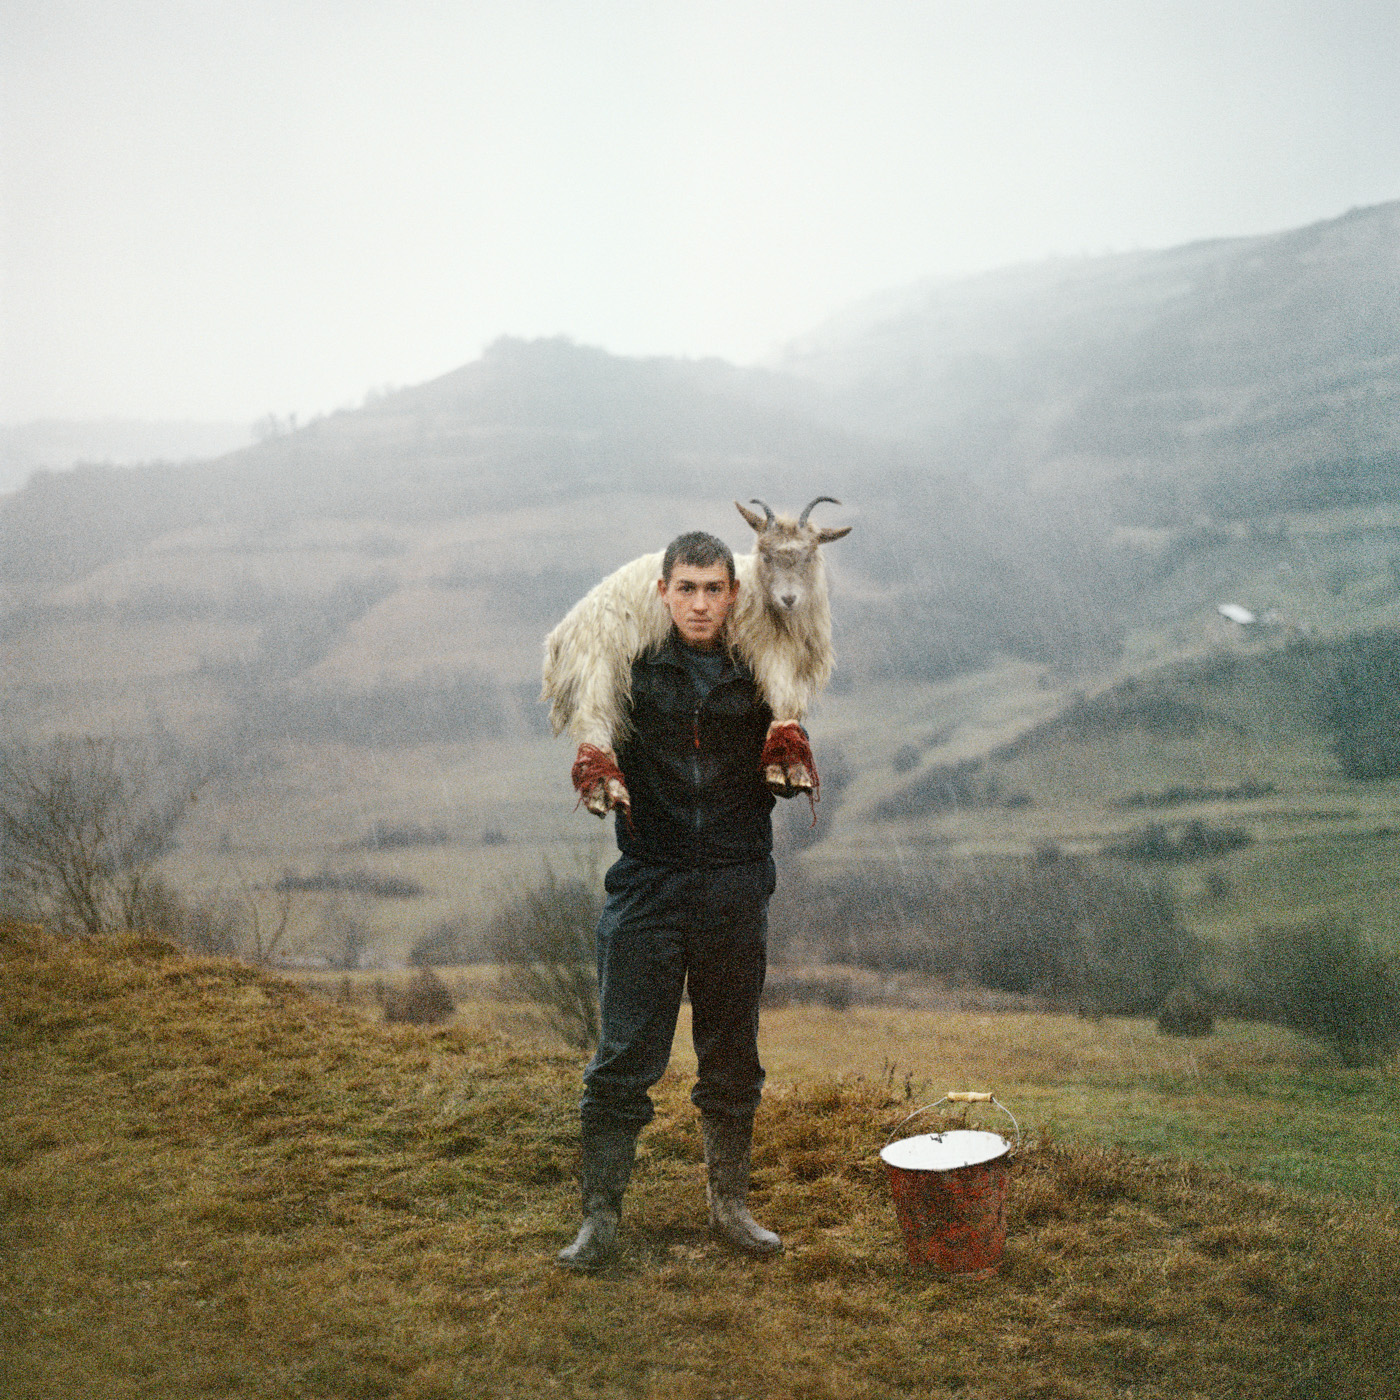 laura_pannack_UK_YWALWD Smith_Ireland_Shepherds--2.jpg